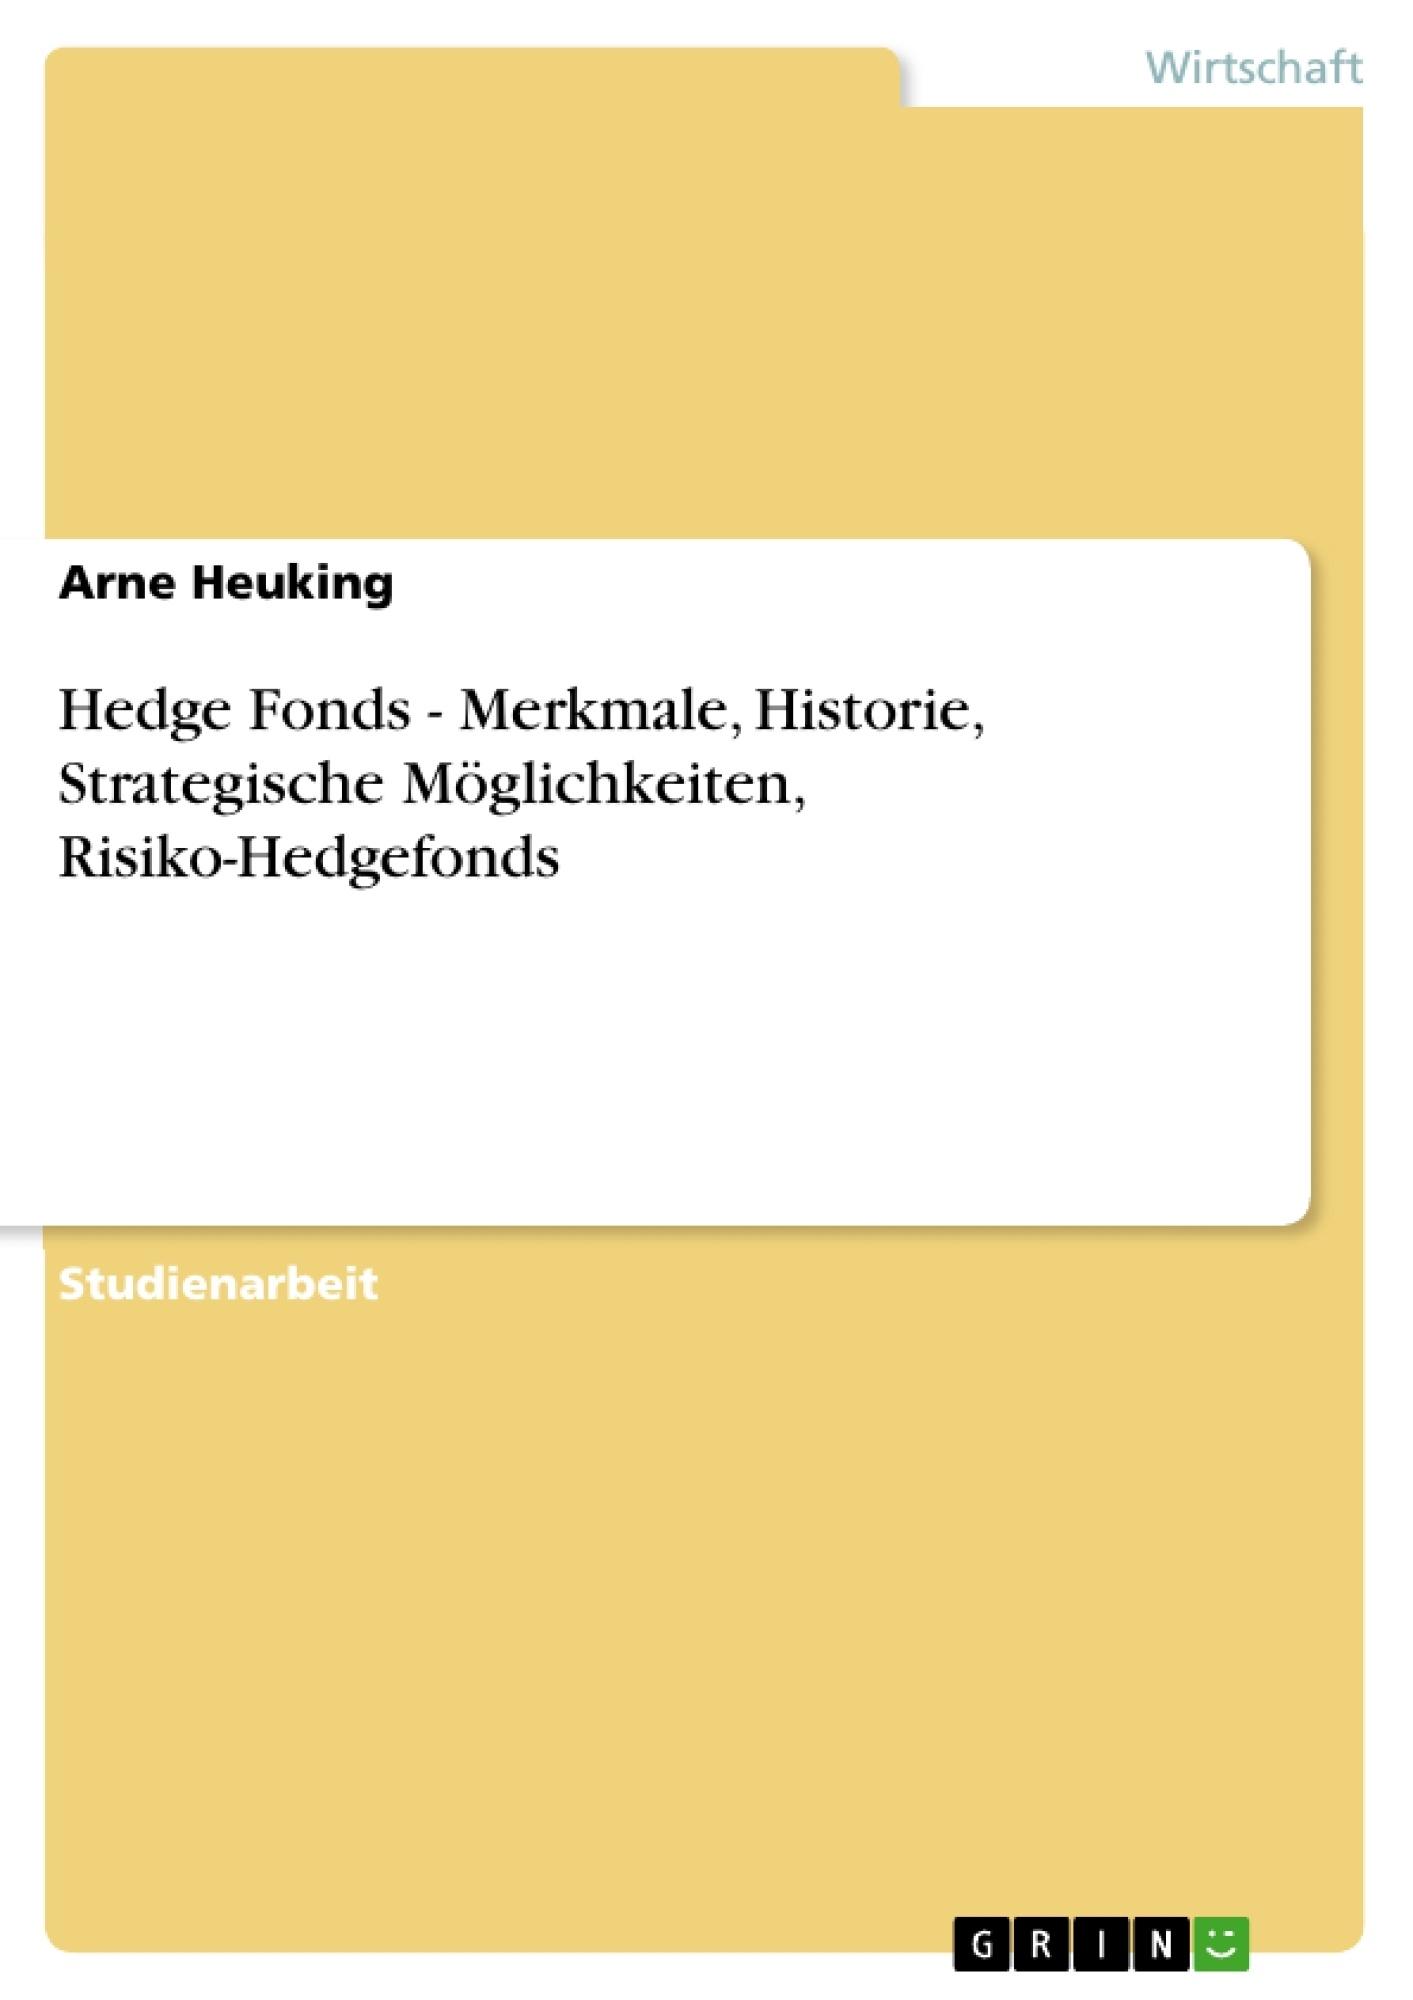 Titel: Hedge Fonds -  Merkmale, Historie, Strategische Möglichkeiten, Risiko-Hedgefonds